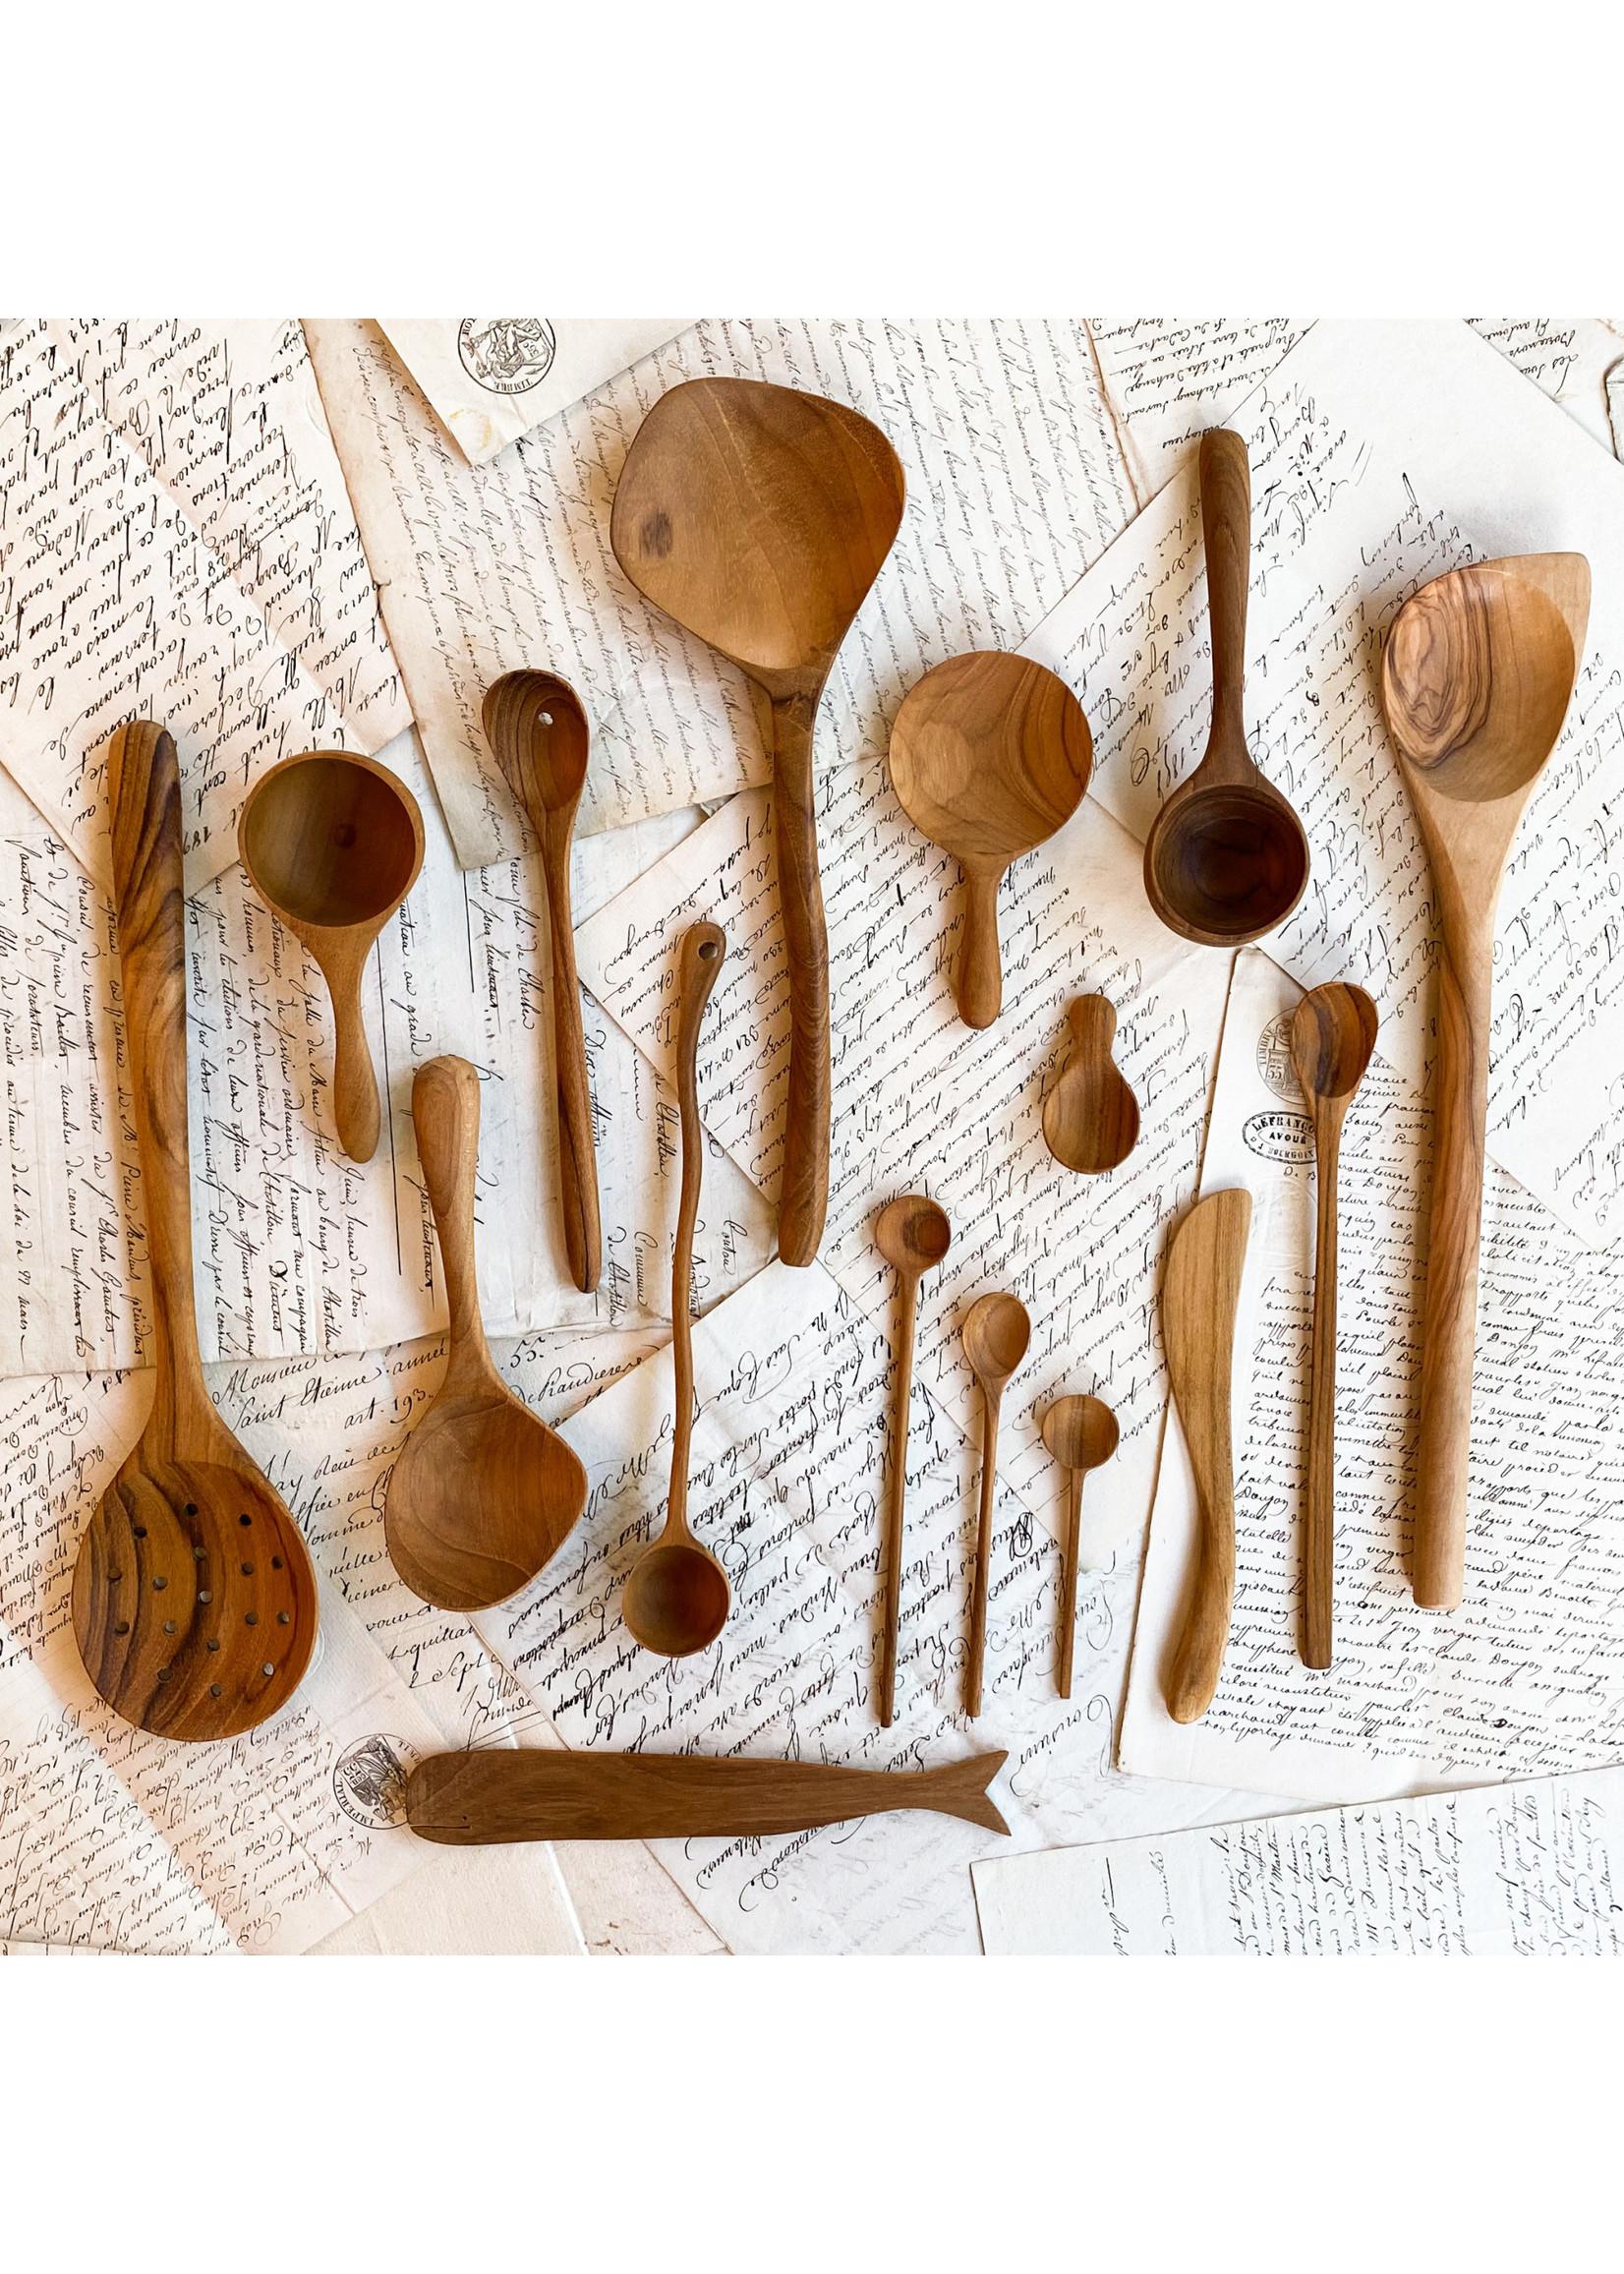 Teak - Spoon - Strainer